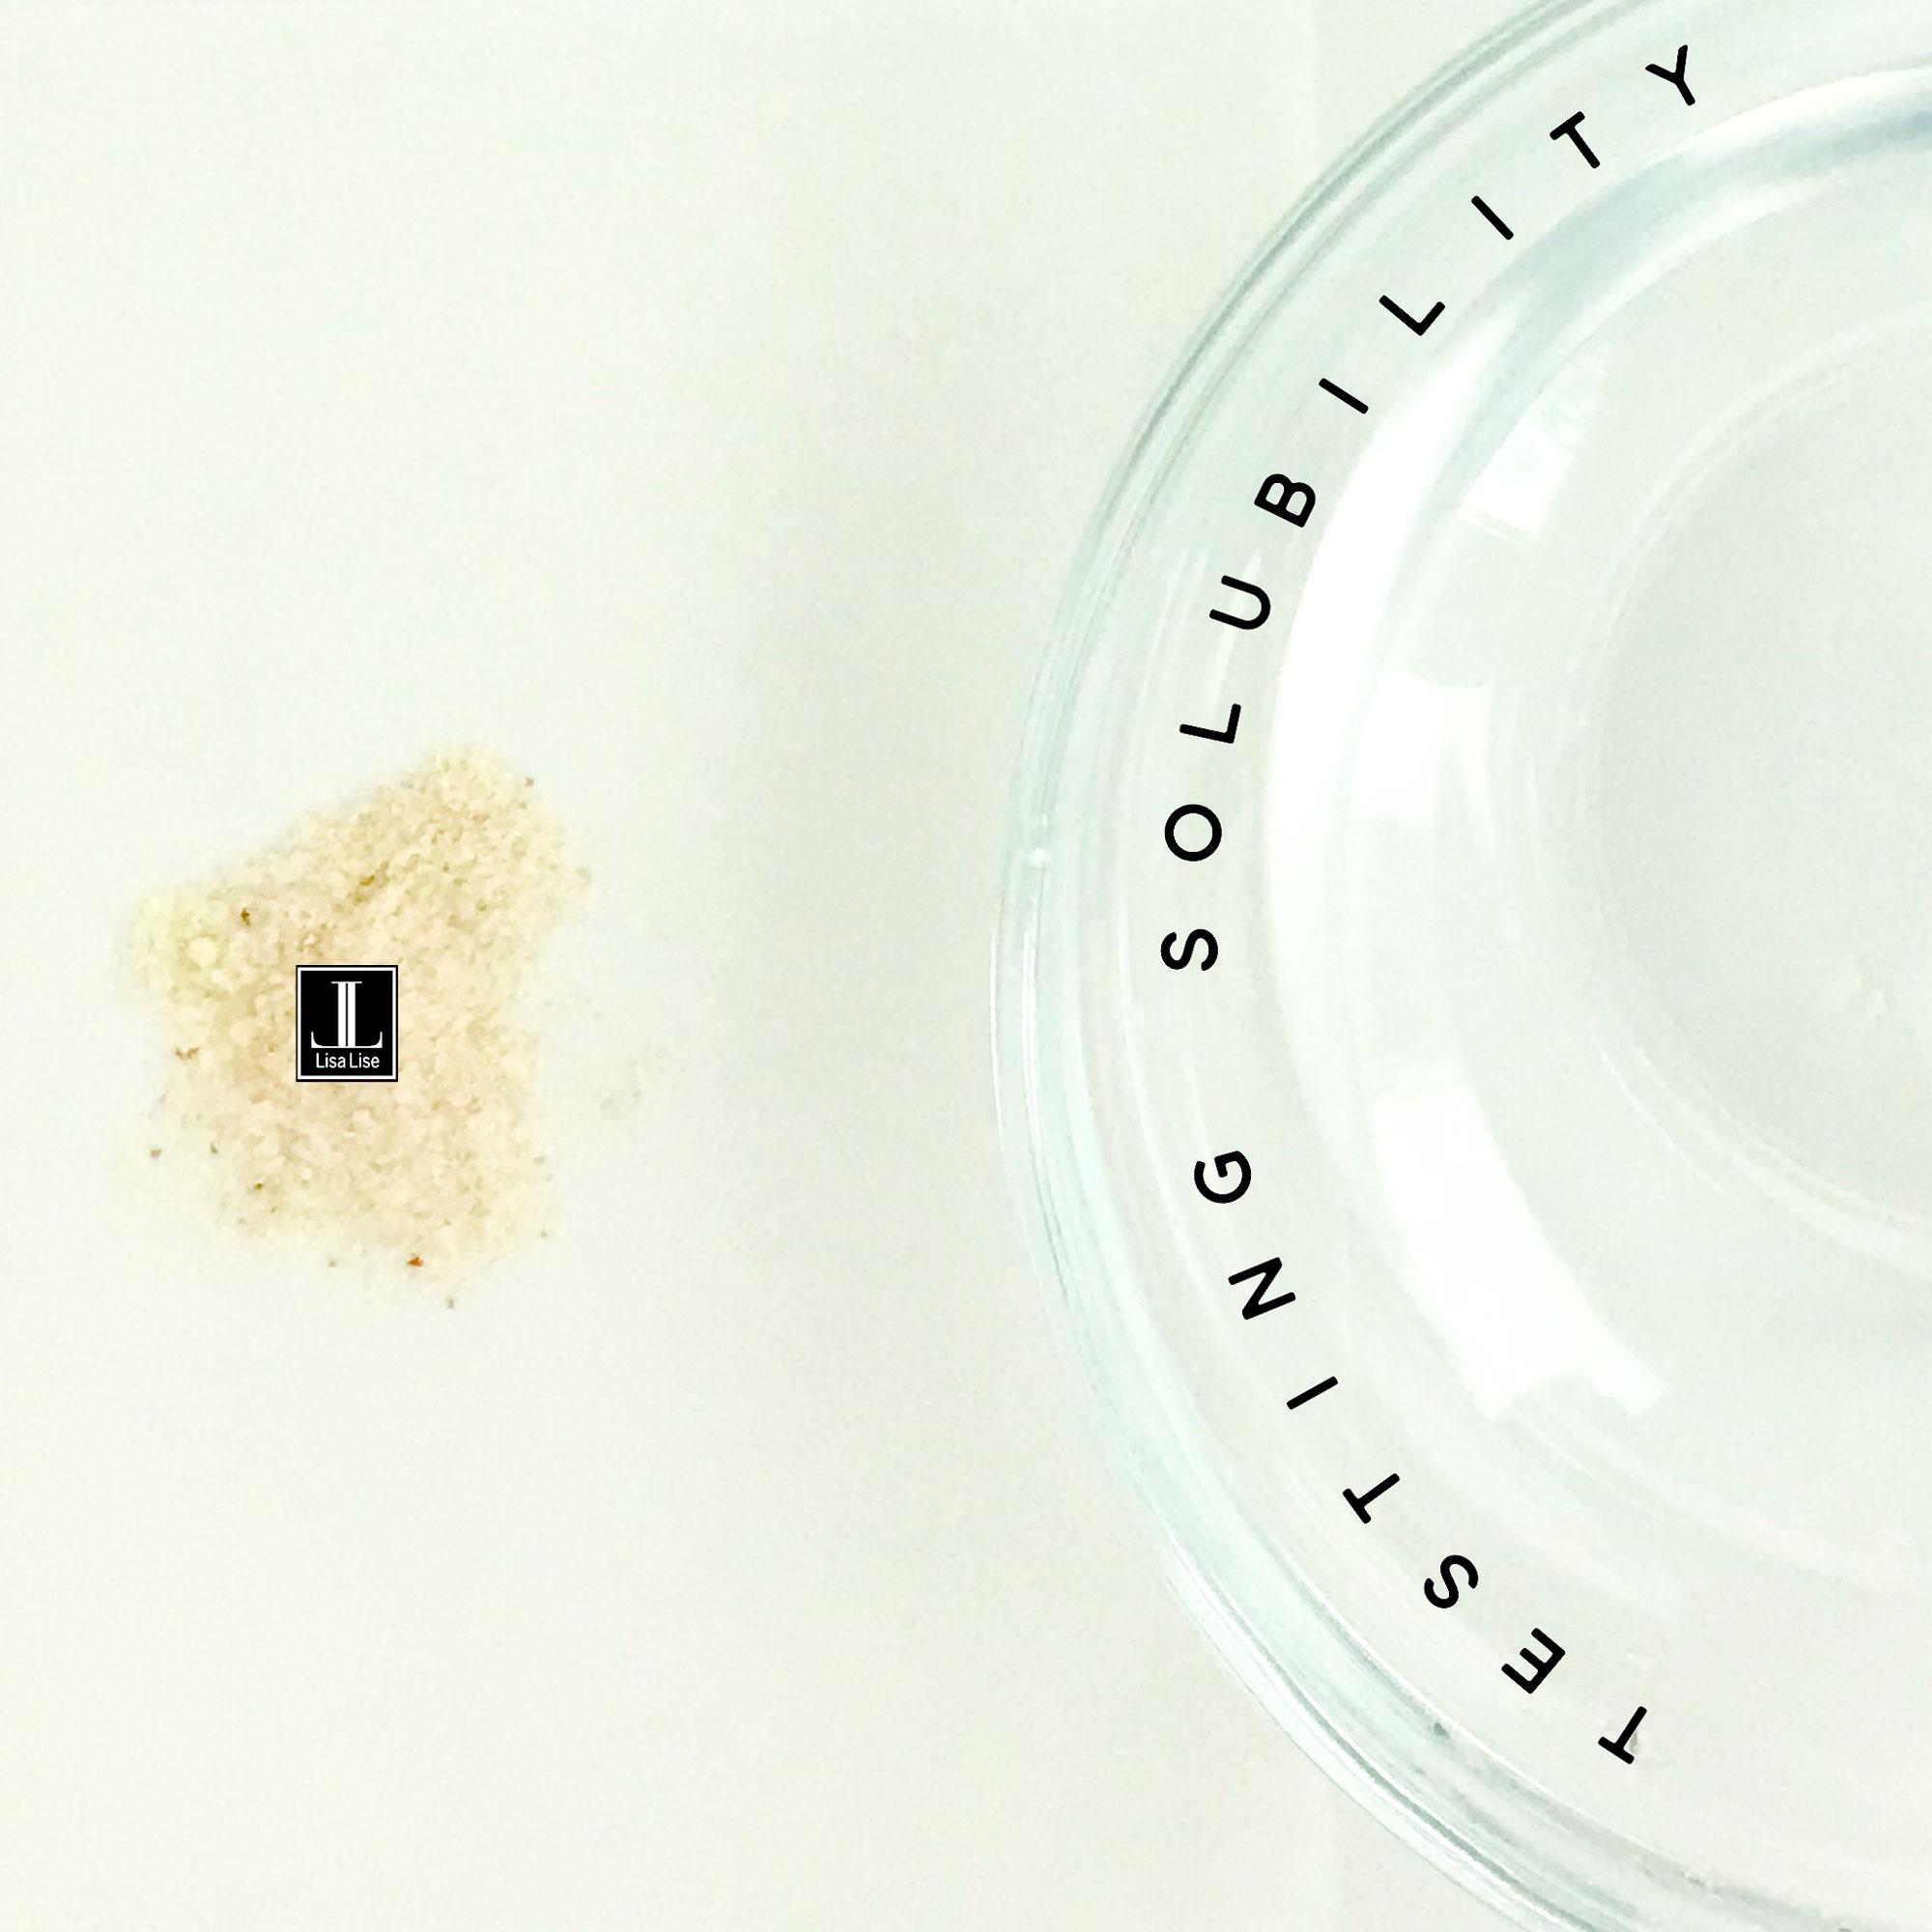 solubility.jpg